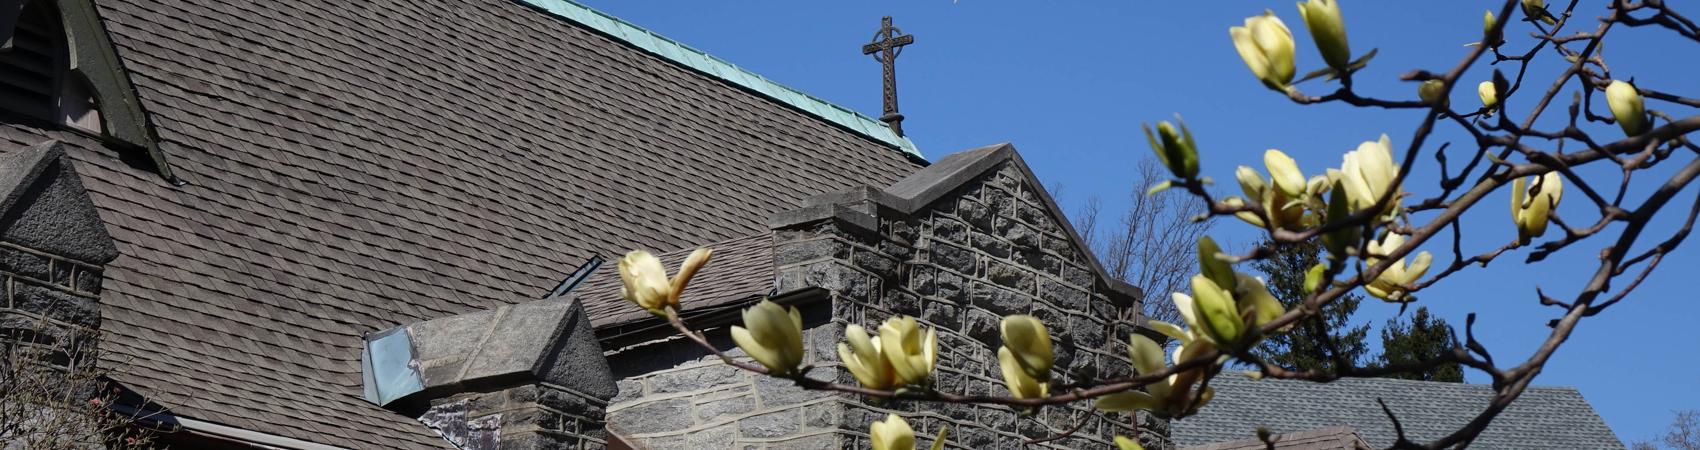 Pastors & Staff – Swarthmore Presbyterian Church